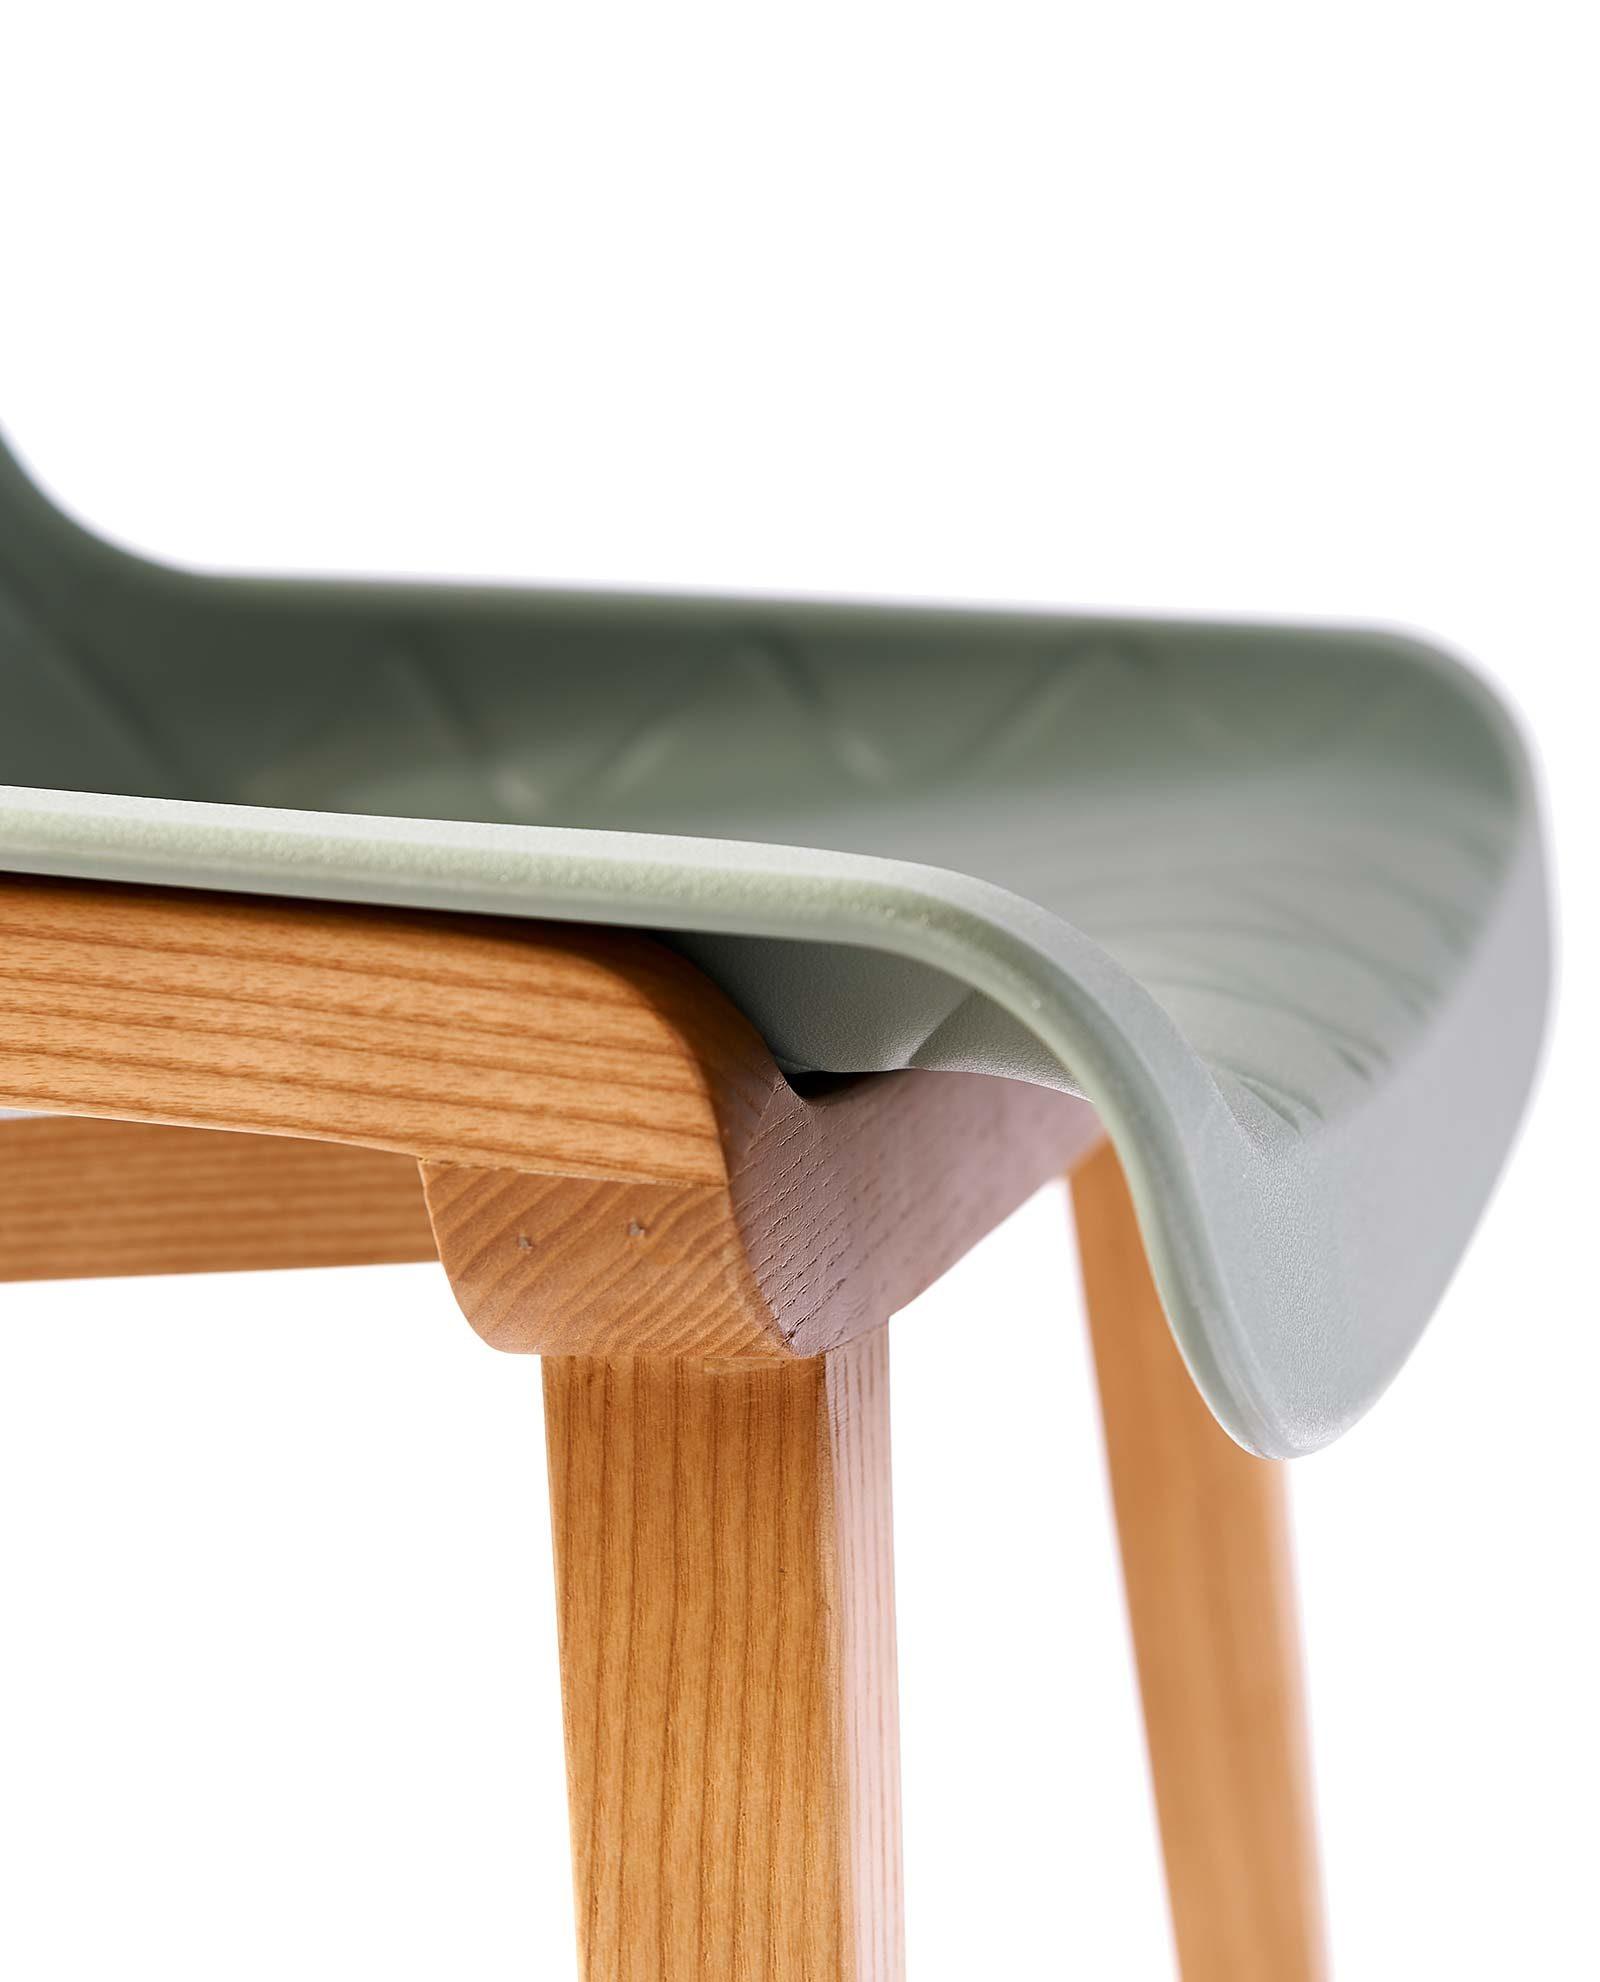 Riviera Maison chaise salle a manger Amsterdam City Green 4321003 5